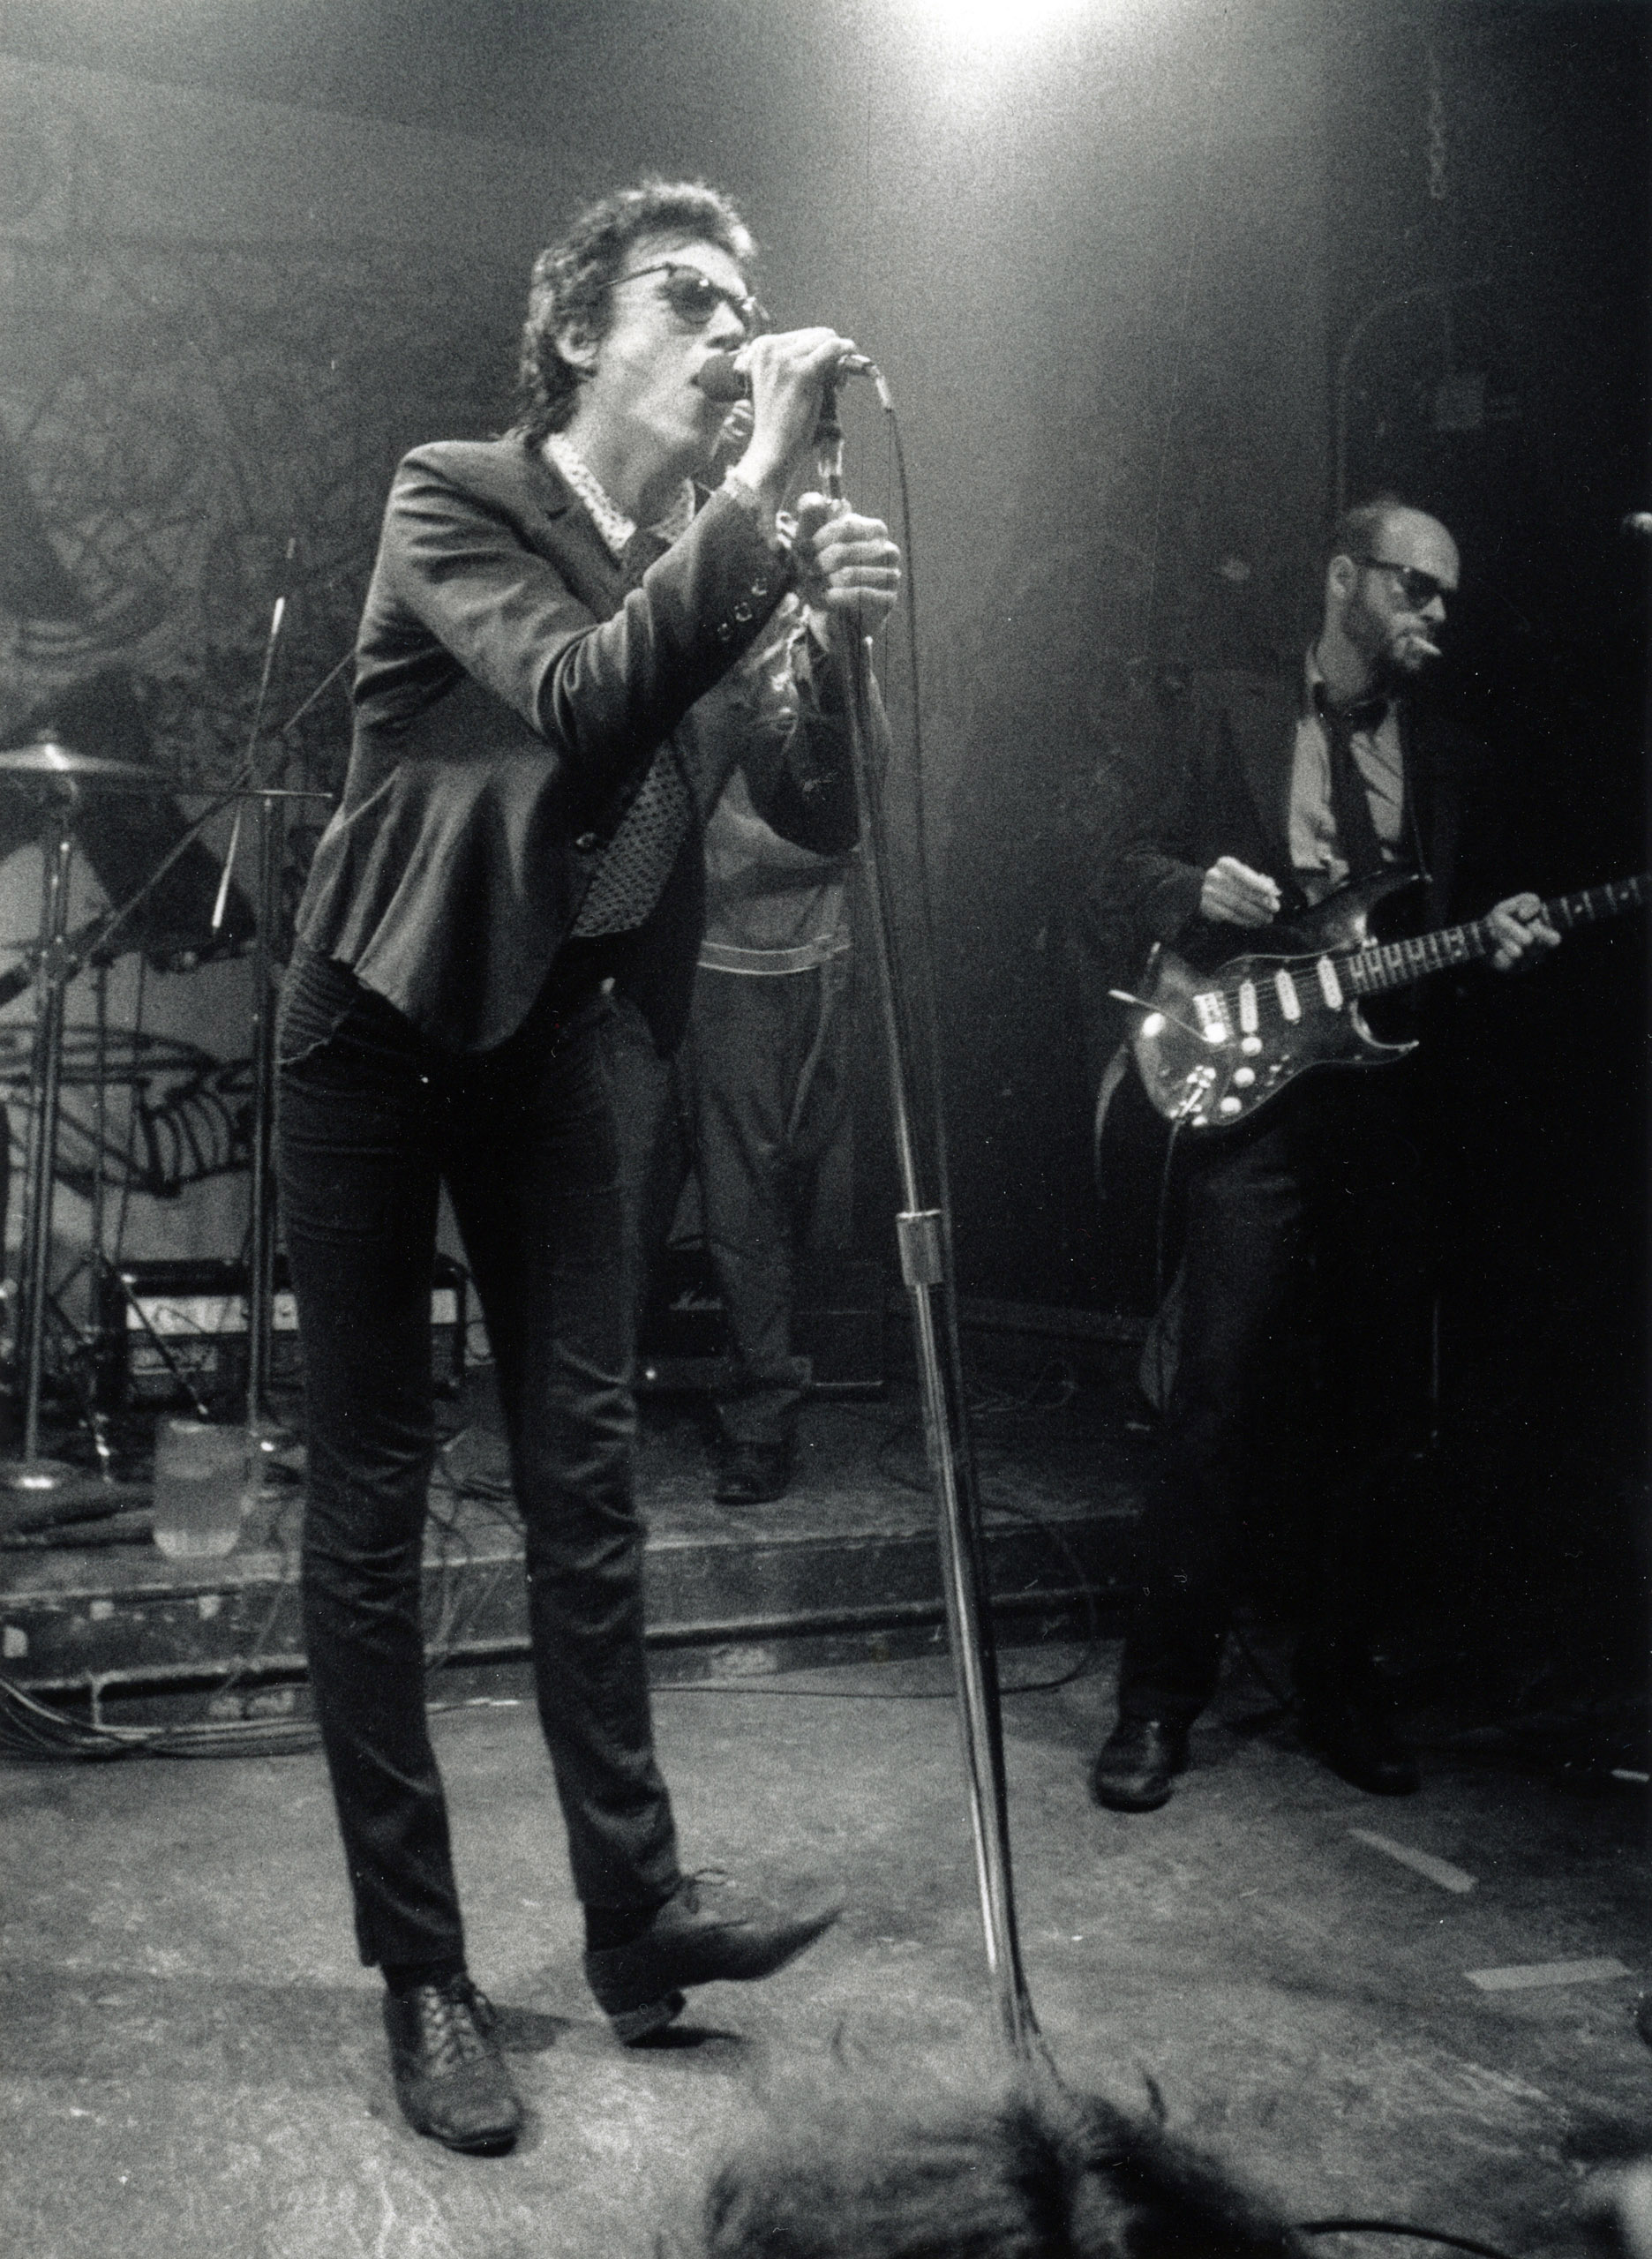 Richard Hell and Bob Quine, CBGB, 1978.